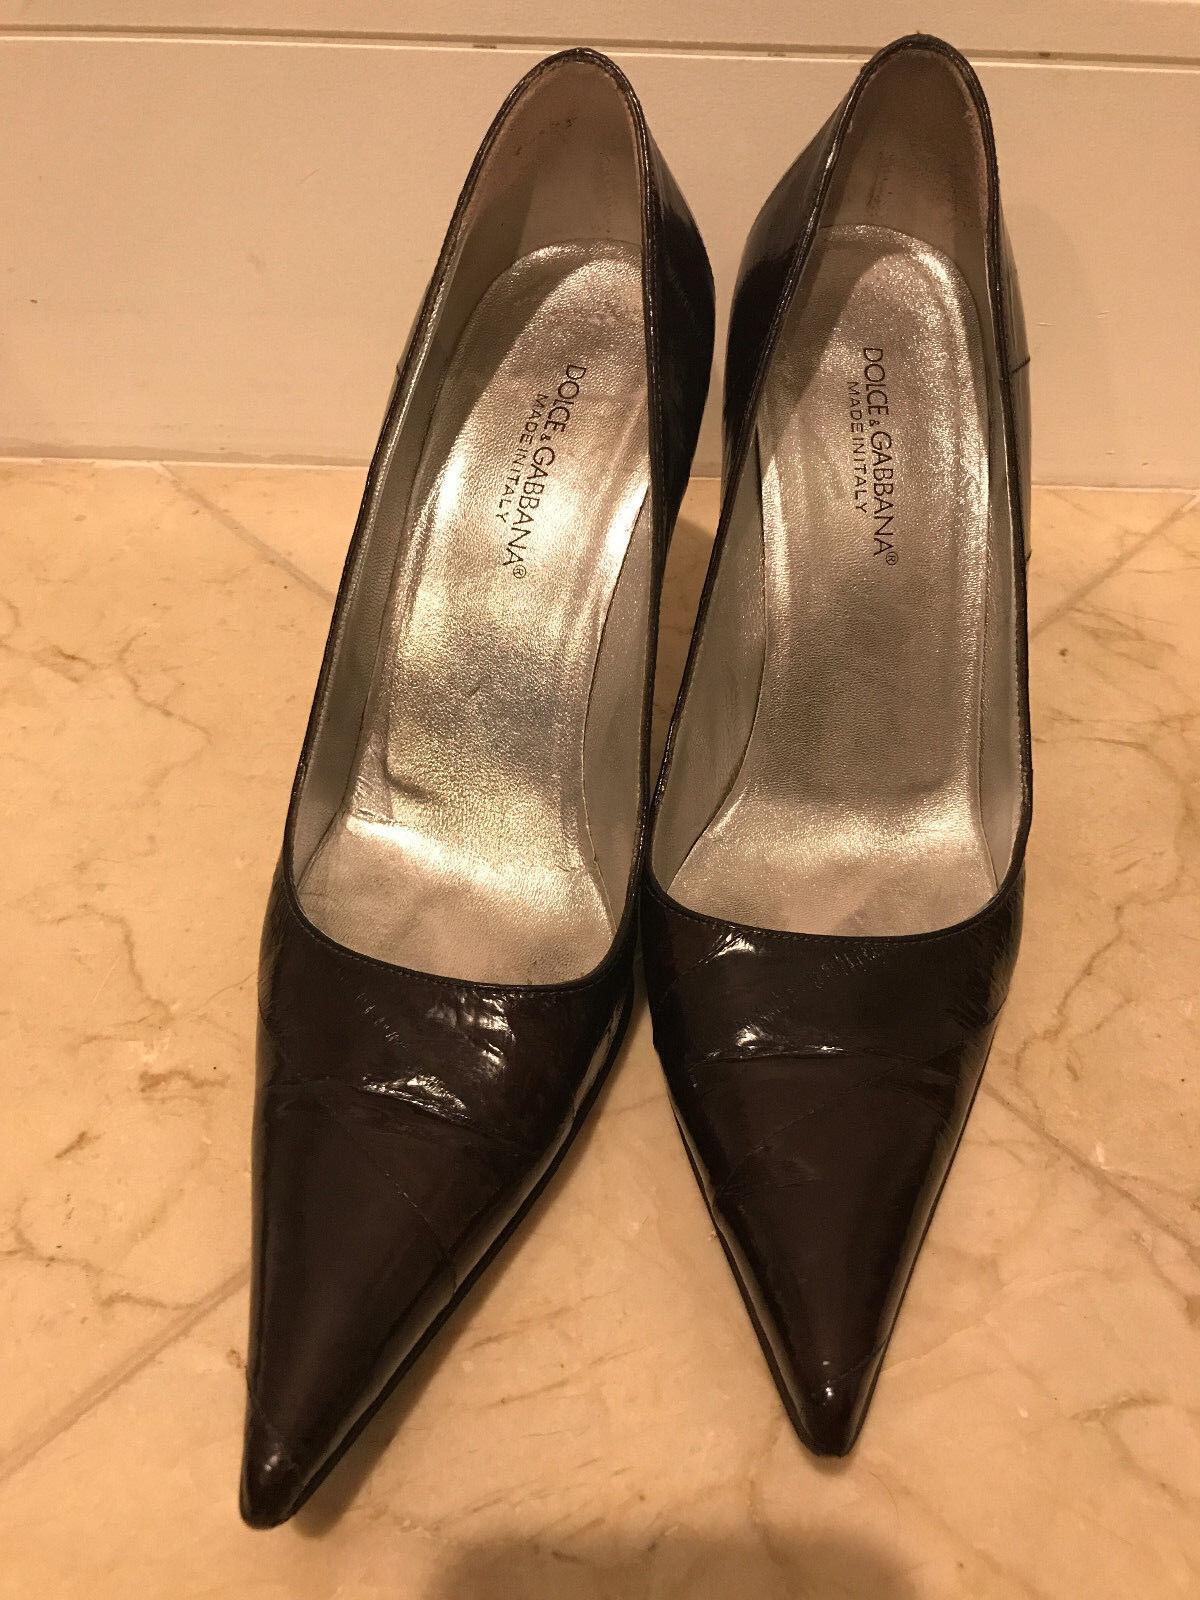 Dolce & Gabbana Burgundy Leder Pointed Toe Pumps Heels Schuhes Größe 38.5 SHARWEI